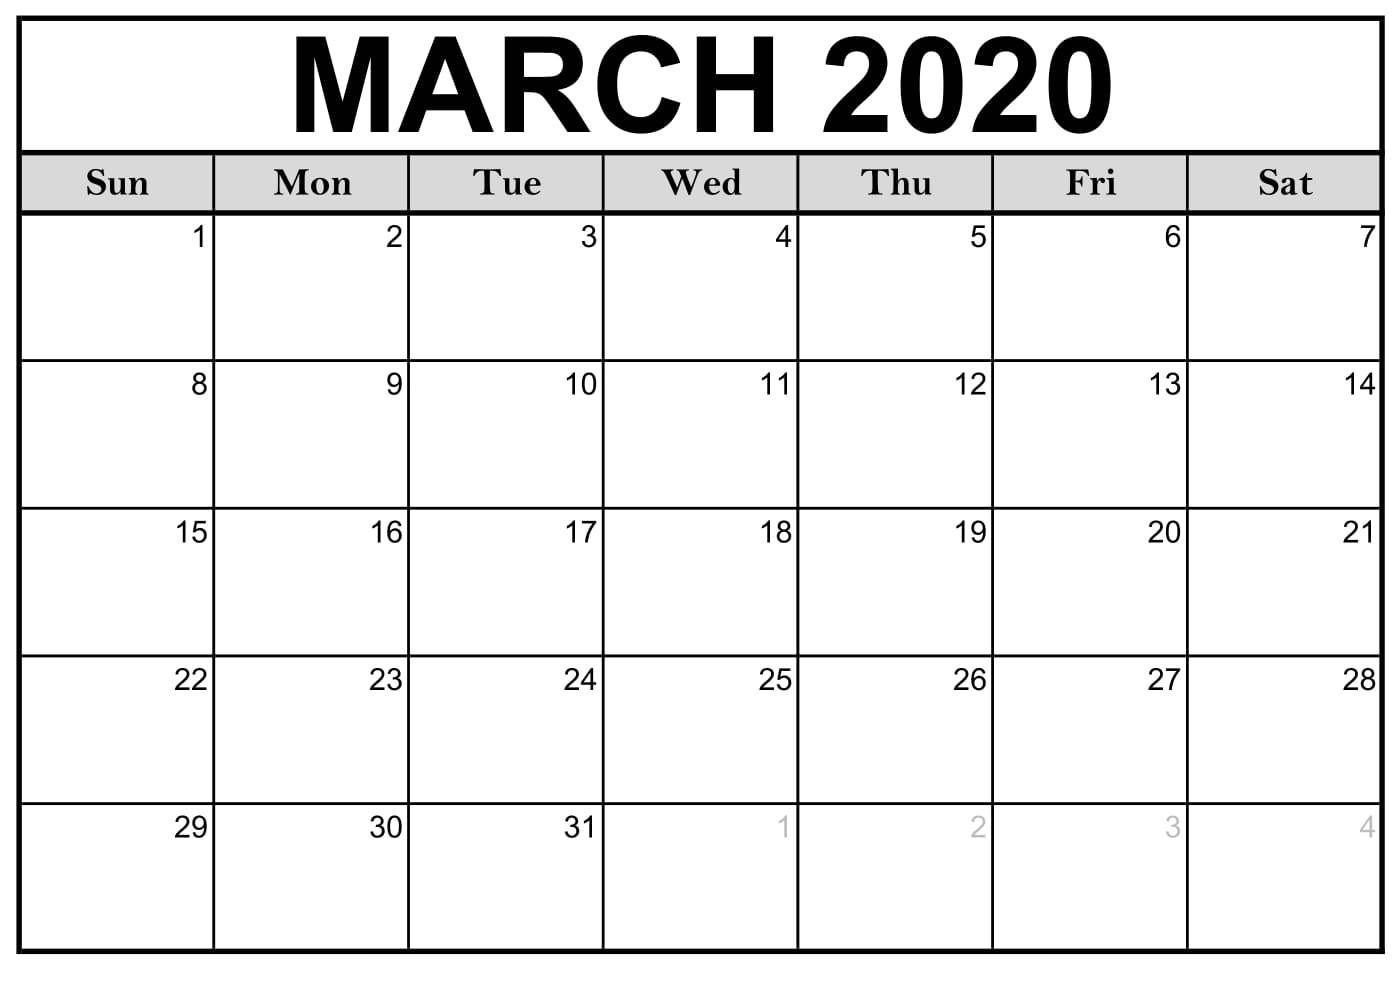 Printable Fill In 2020 Calndar – Calendar Inspiration Design Calendar To Fill In And Print